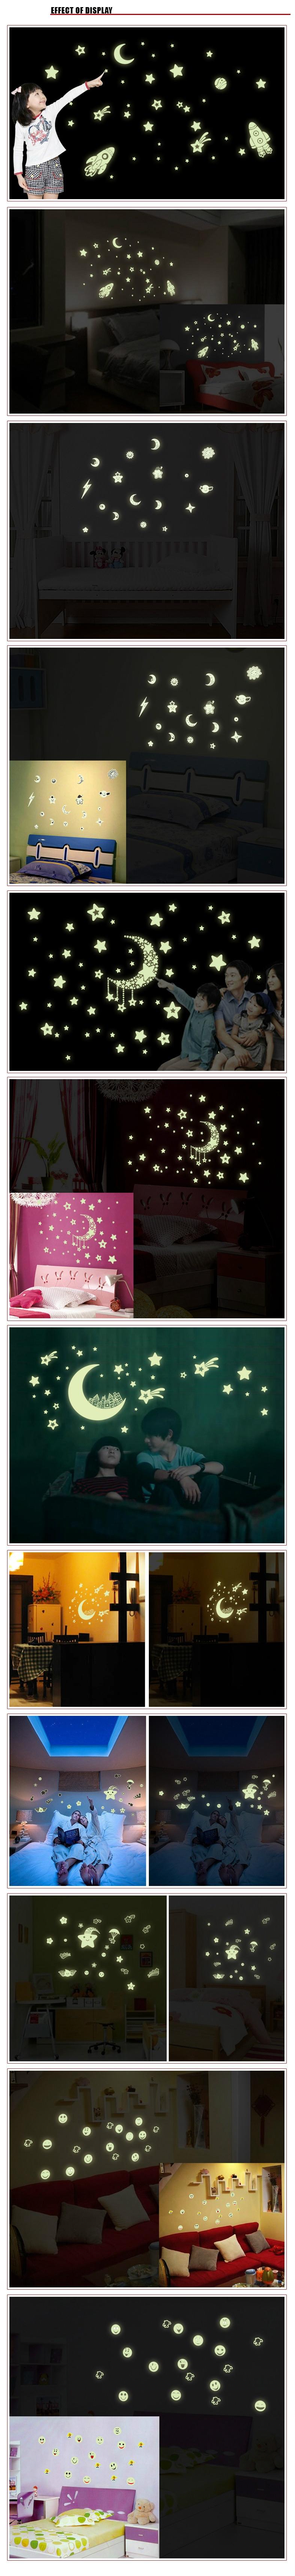 Glow In The Dark Home Decor Shining Star Luminescence Sticker